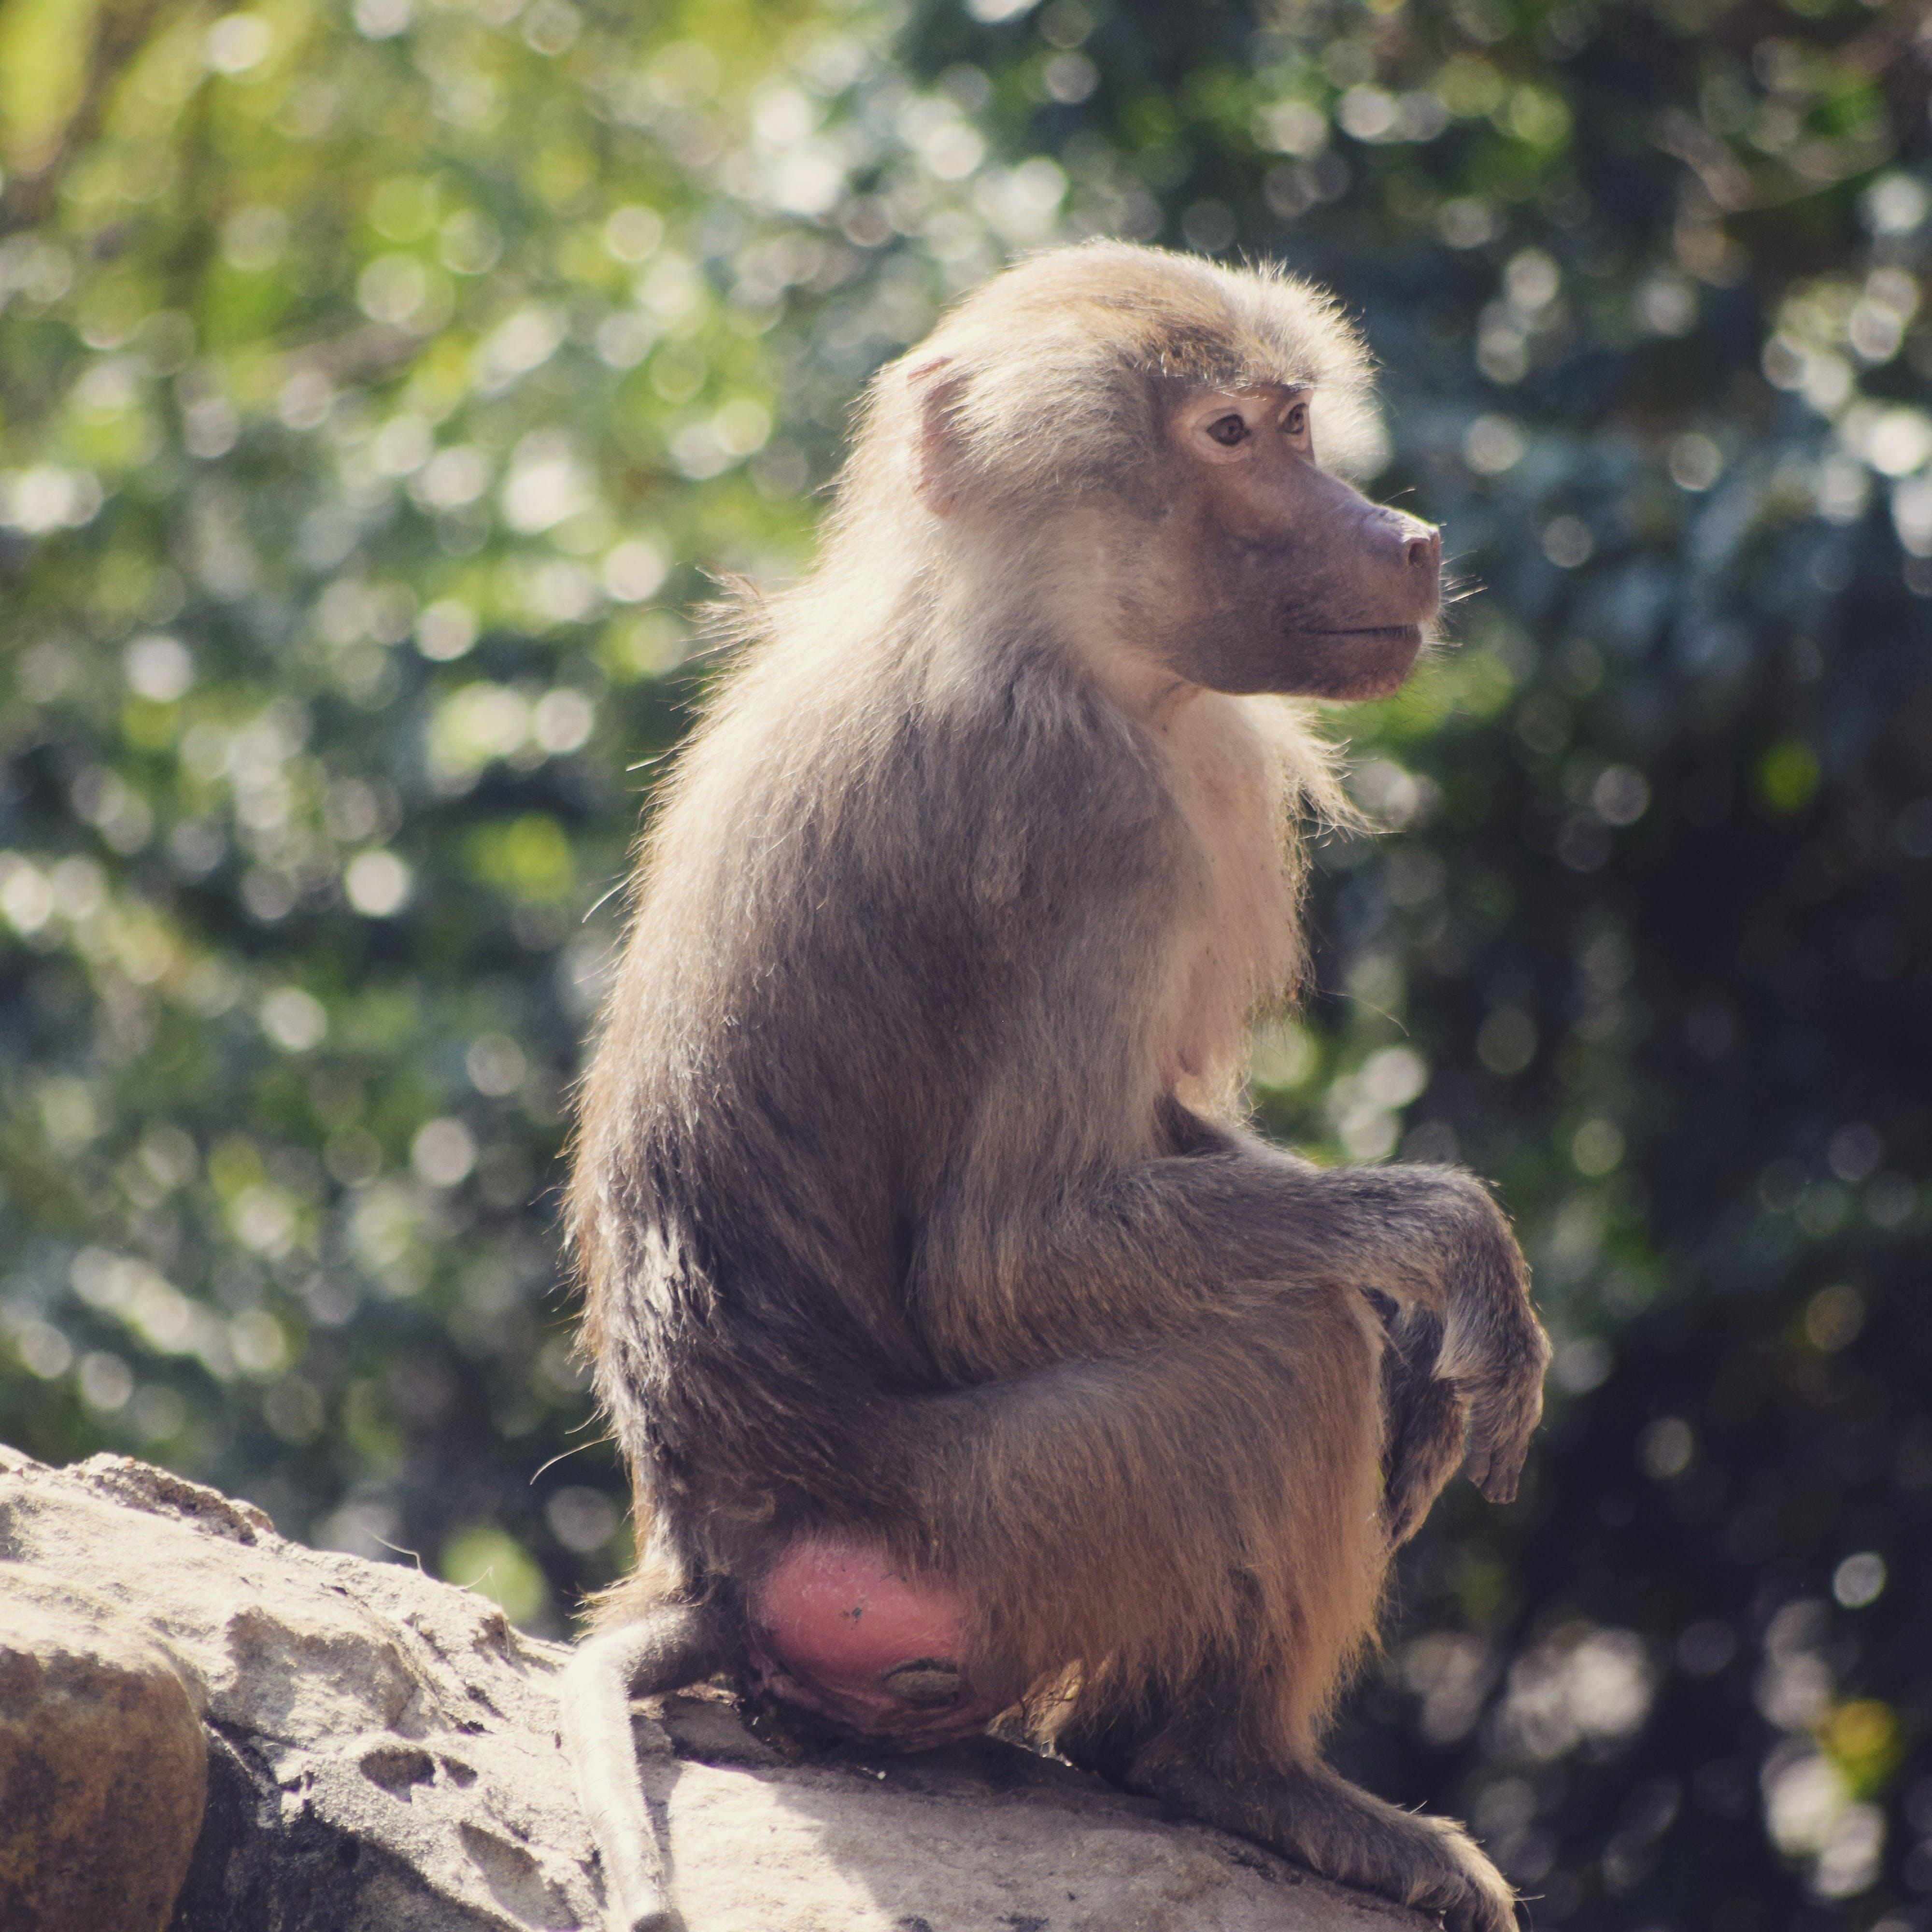 Brown Monkey on Rock Monolith